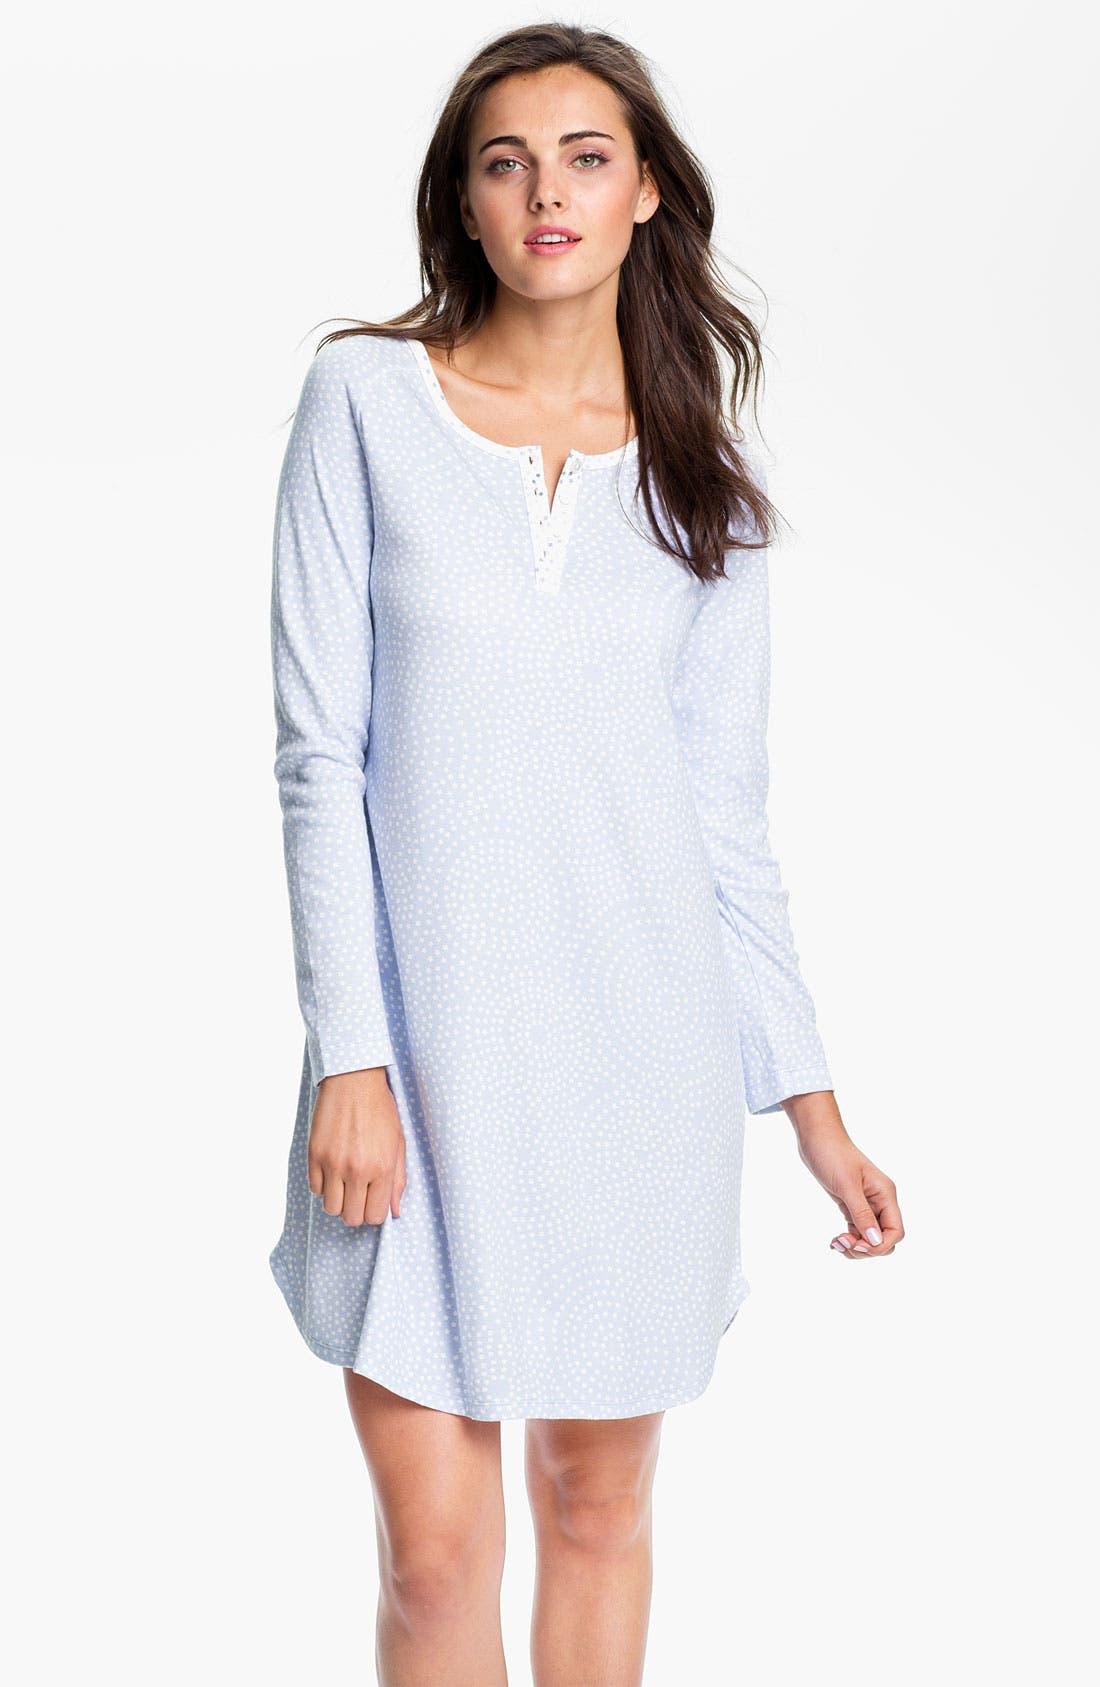 Alternate Image 1 Selected - Carole Hochman Designs Interlock Knit Sleep Shirt